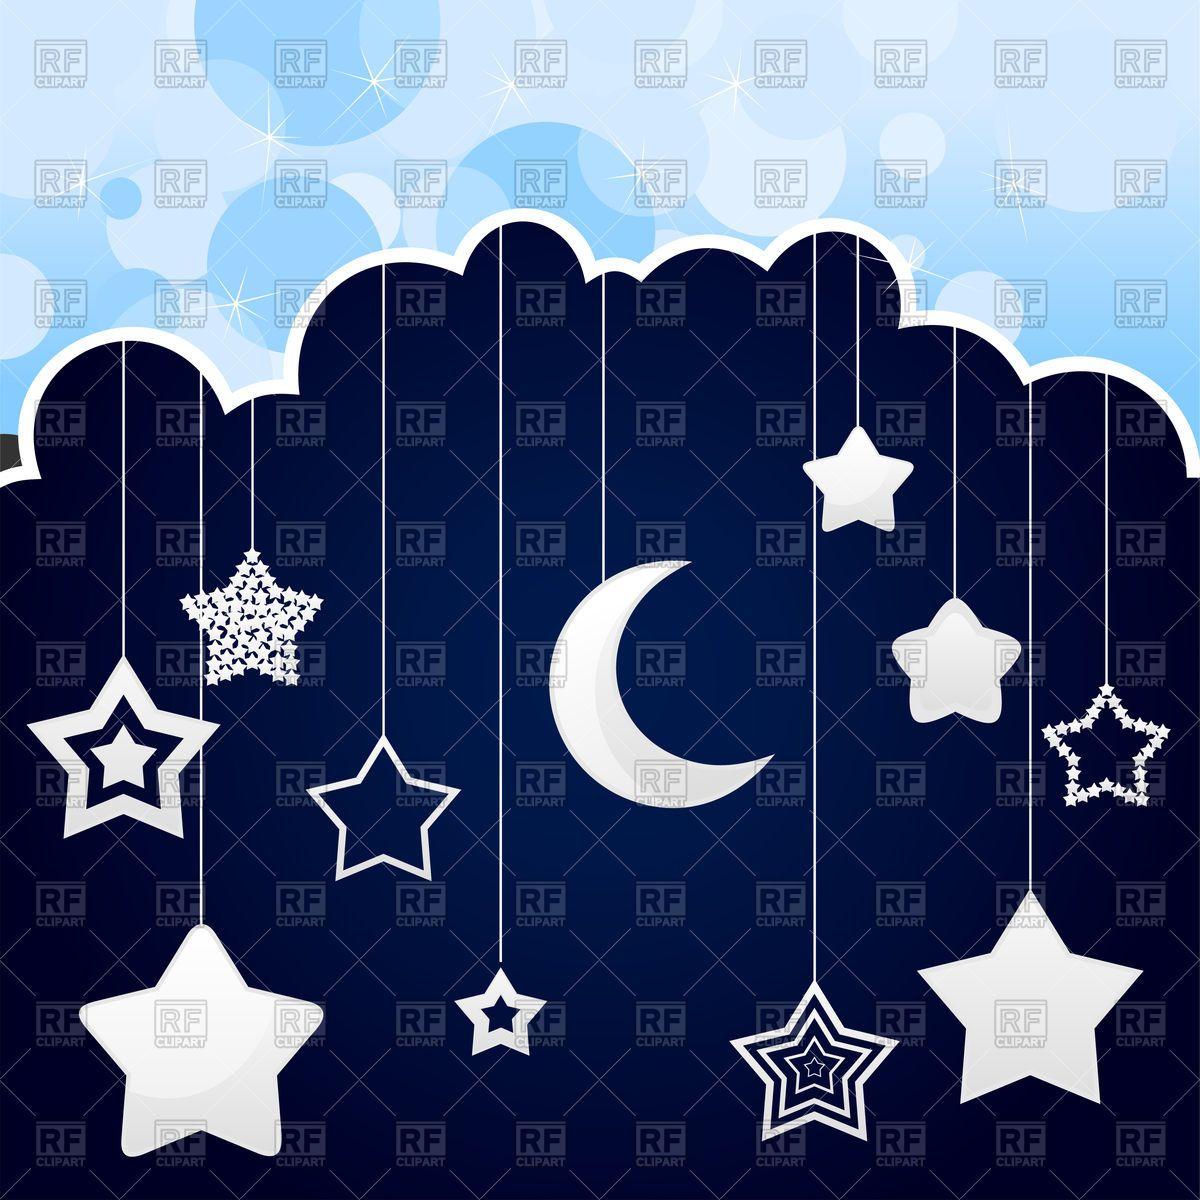 Blue-night-sky-wallpaper | Night sky wallpaper, Night sky photography, Sky  aesthetic